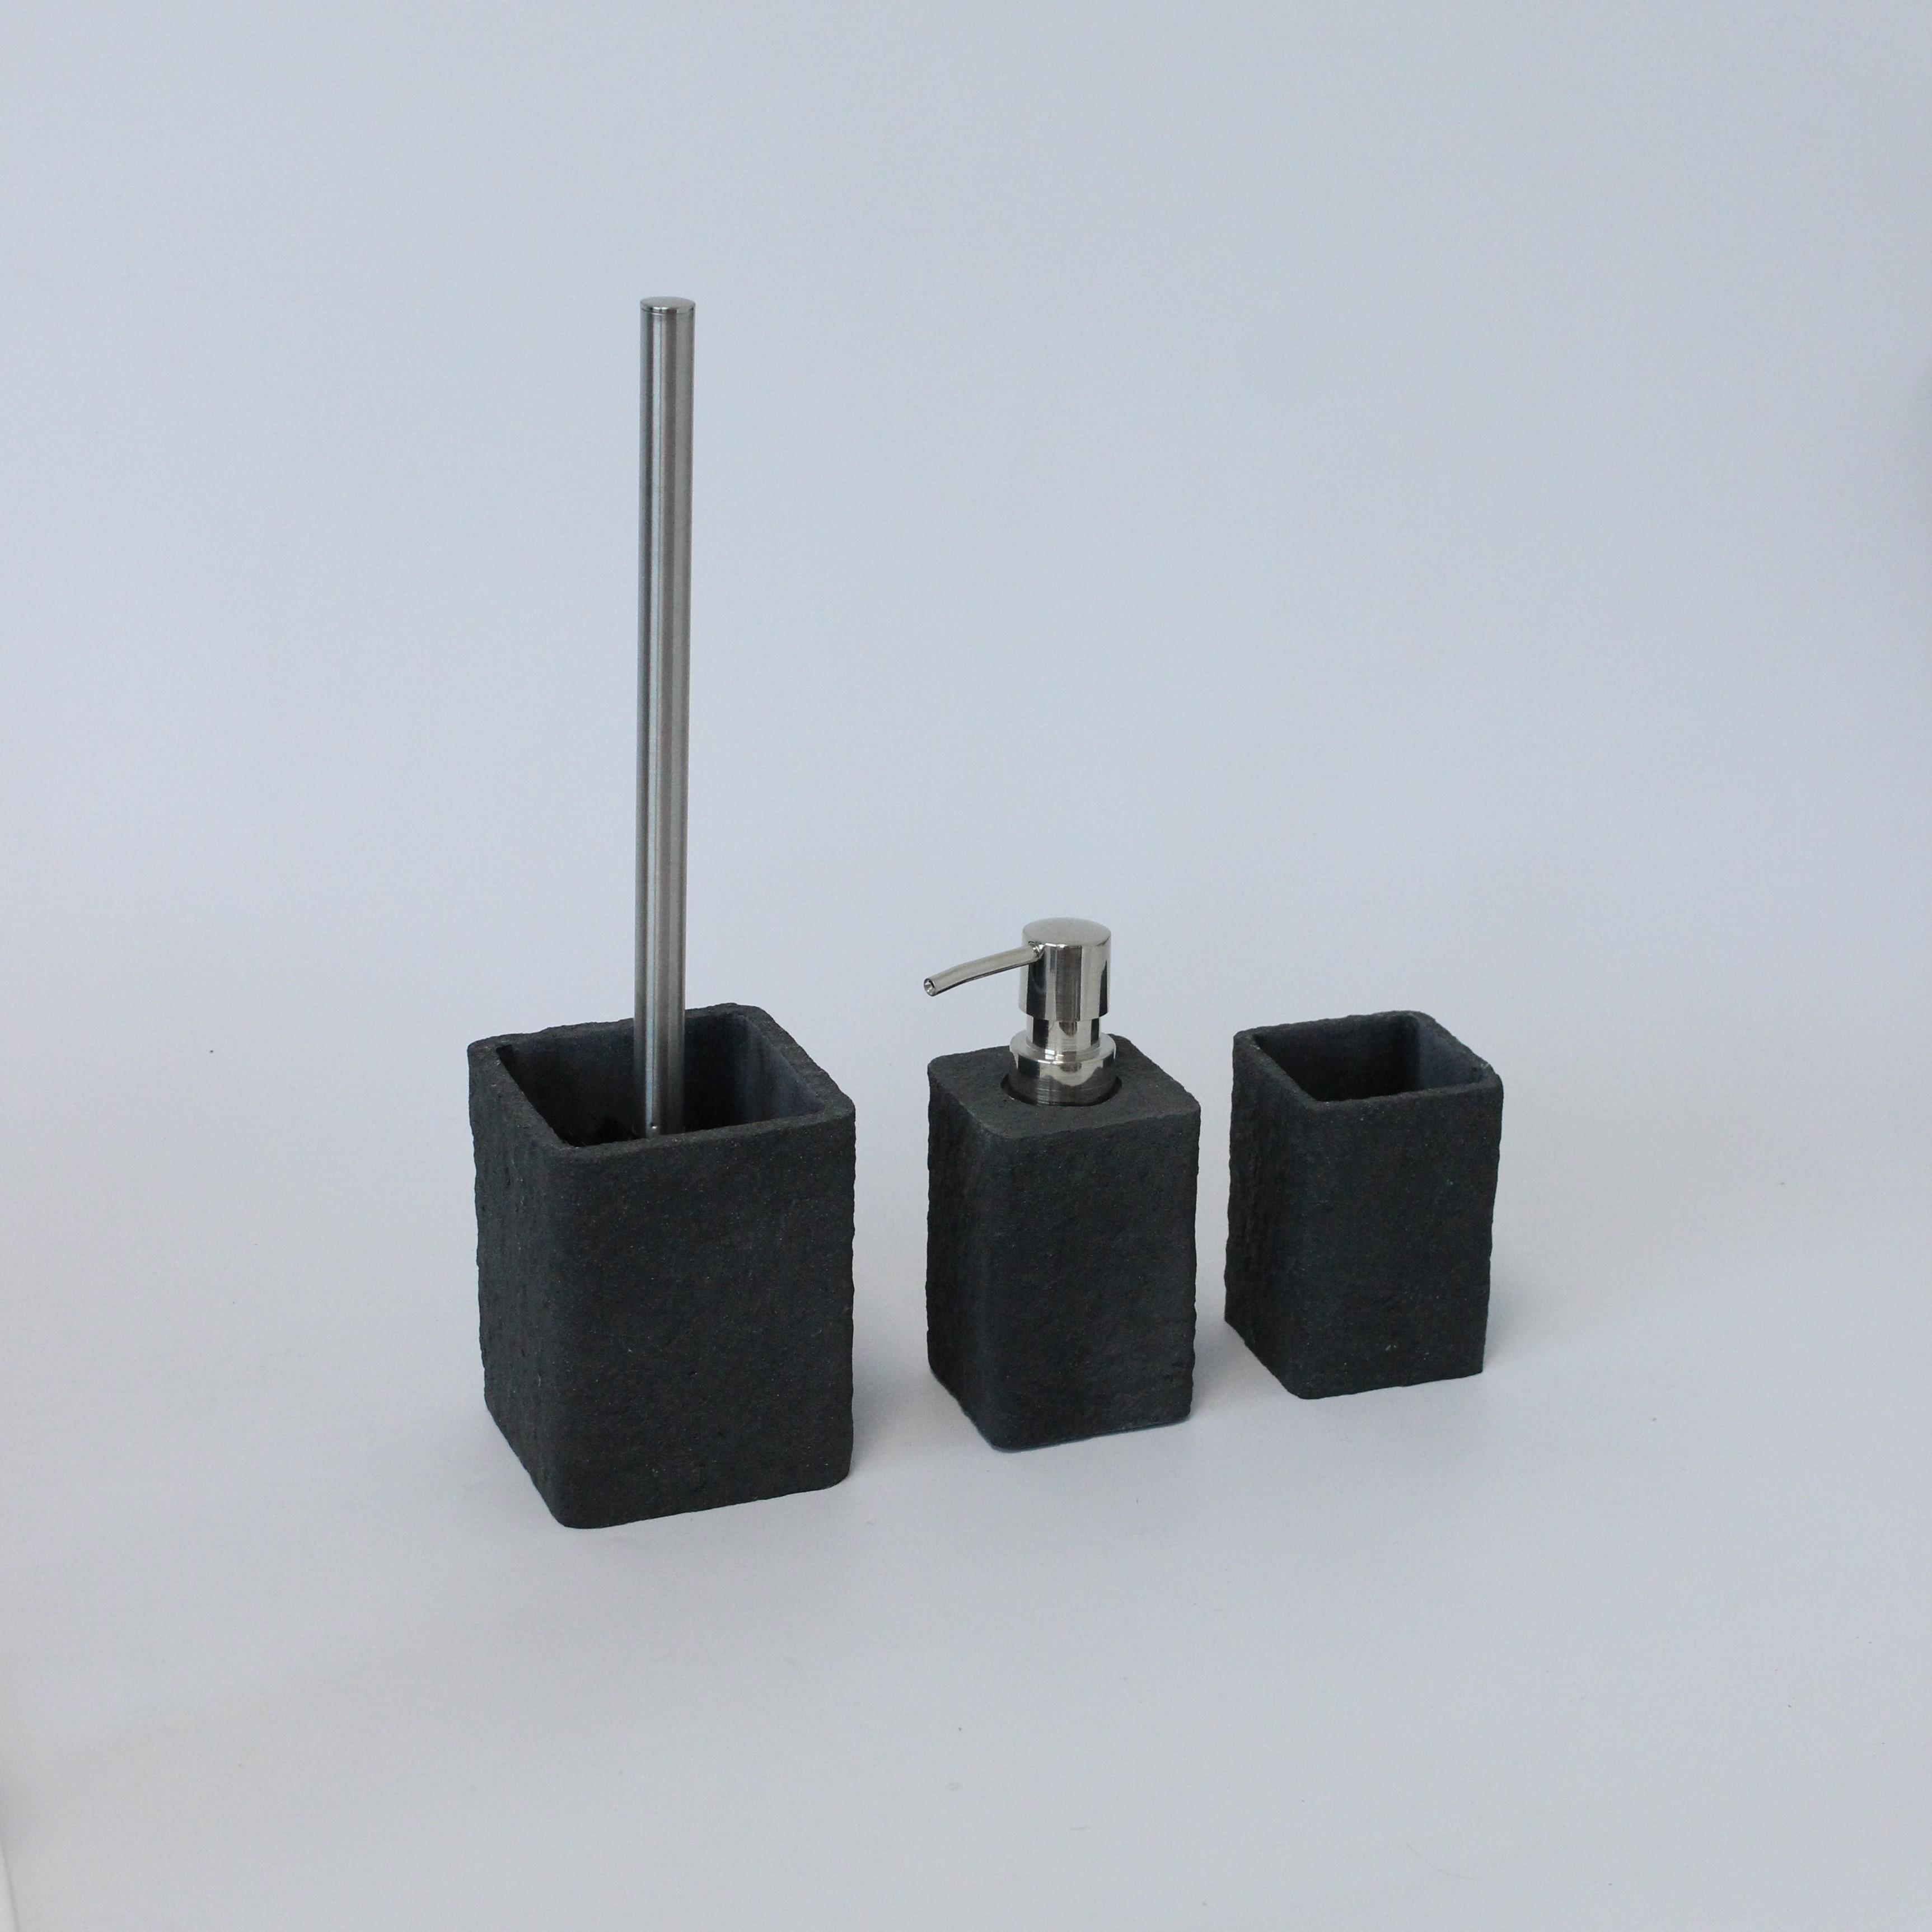 Yubo toilet accessoires set zwart